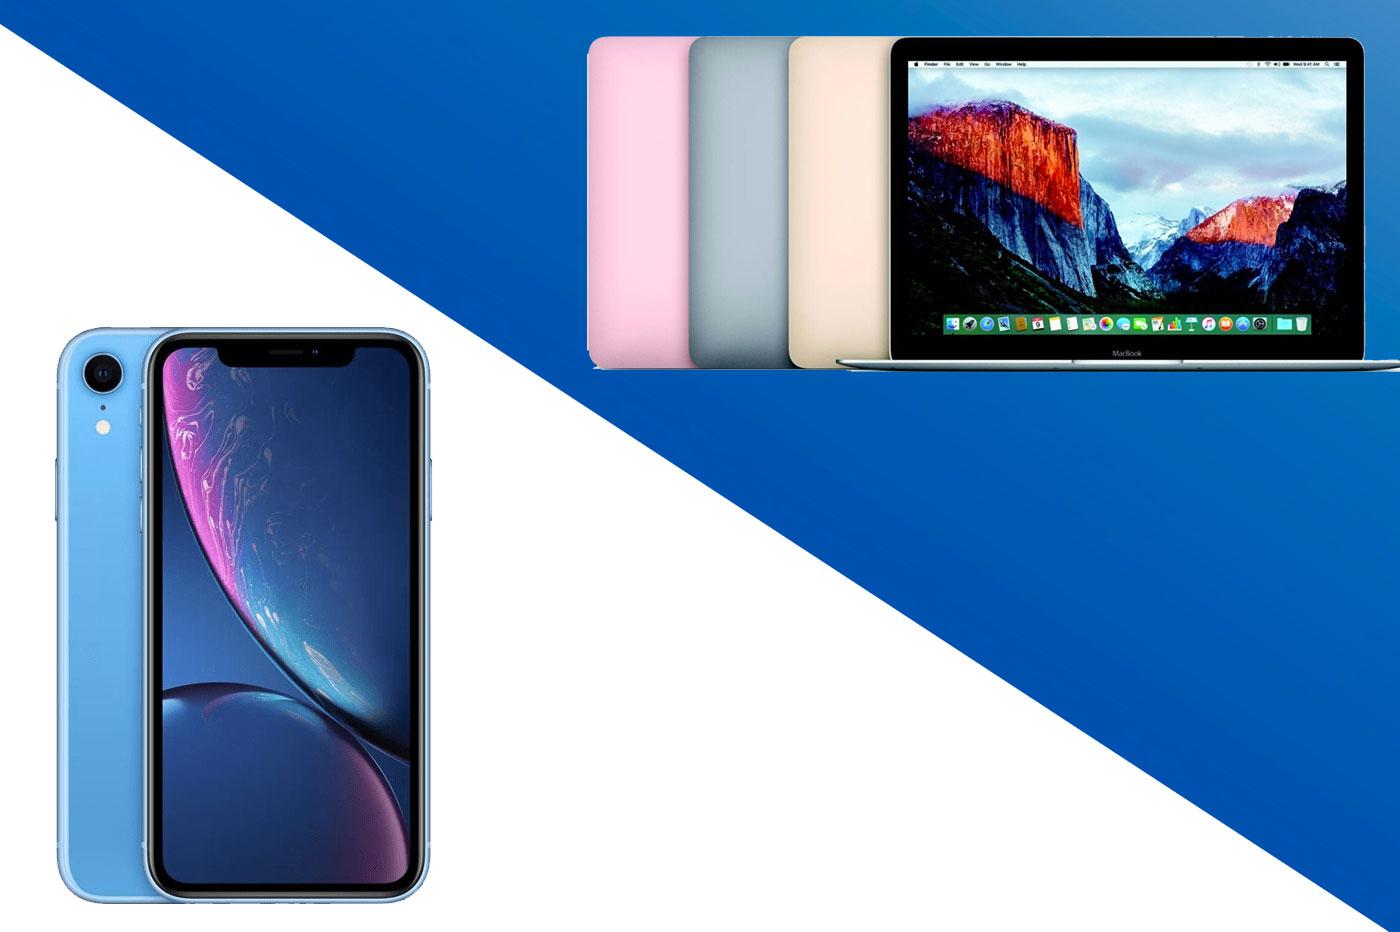 Soldes MacBook iPhone XR